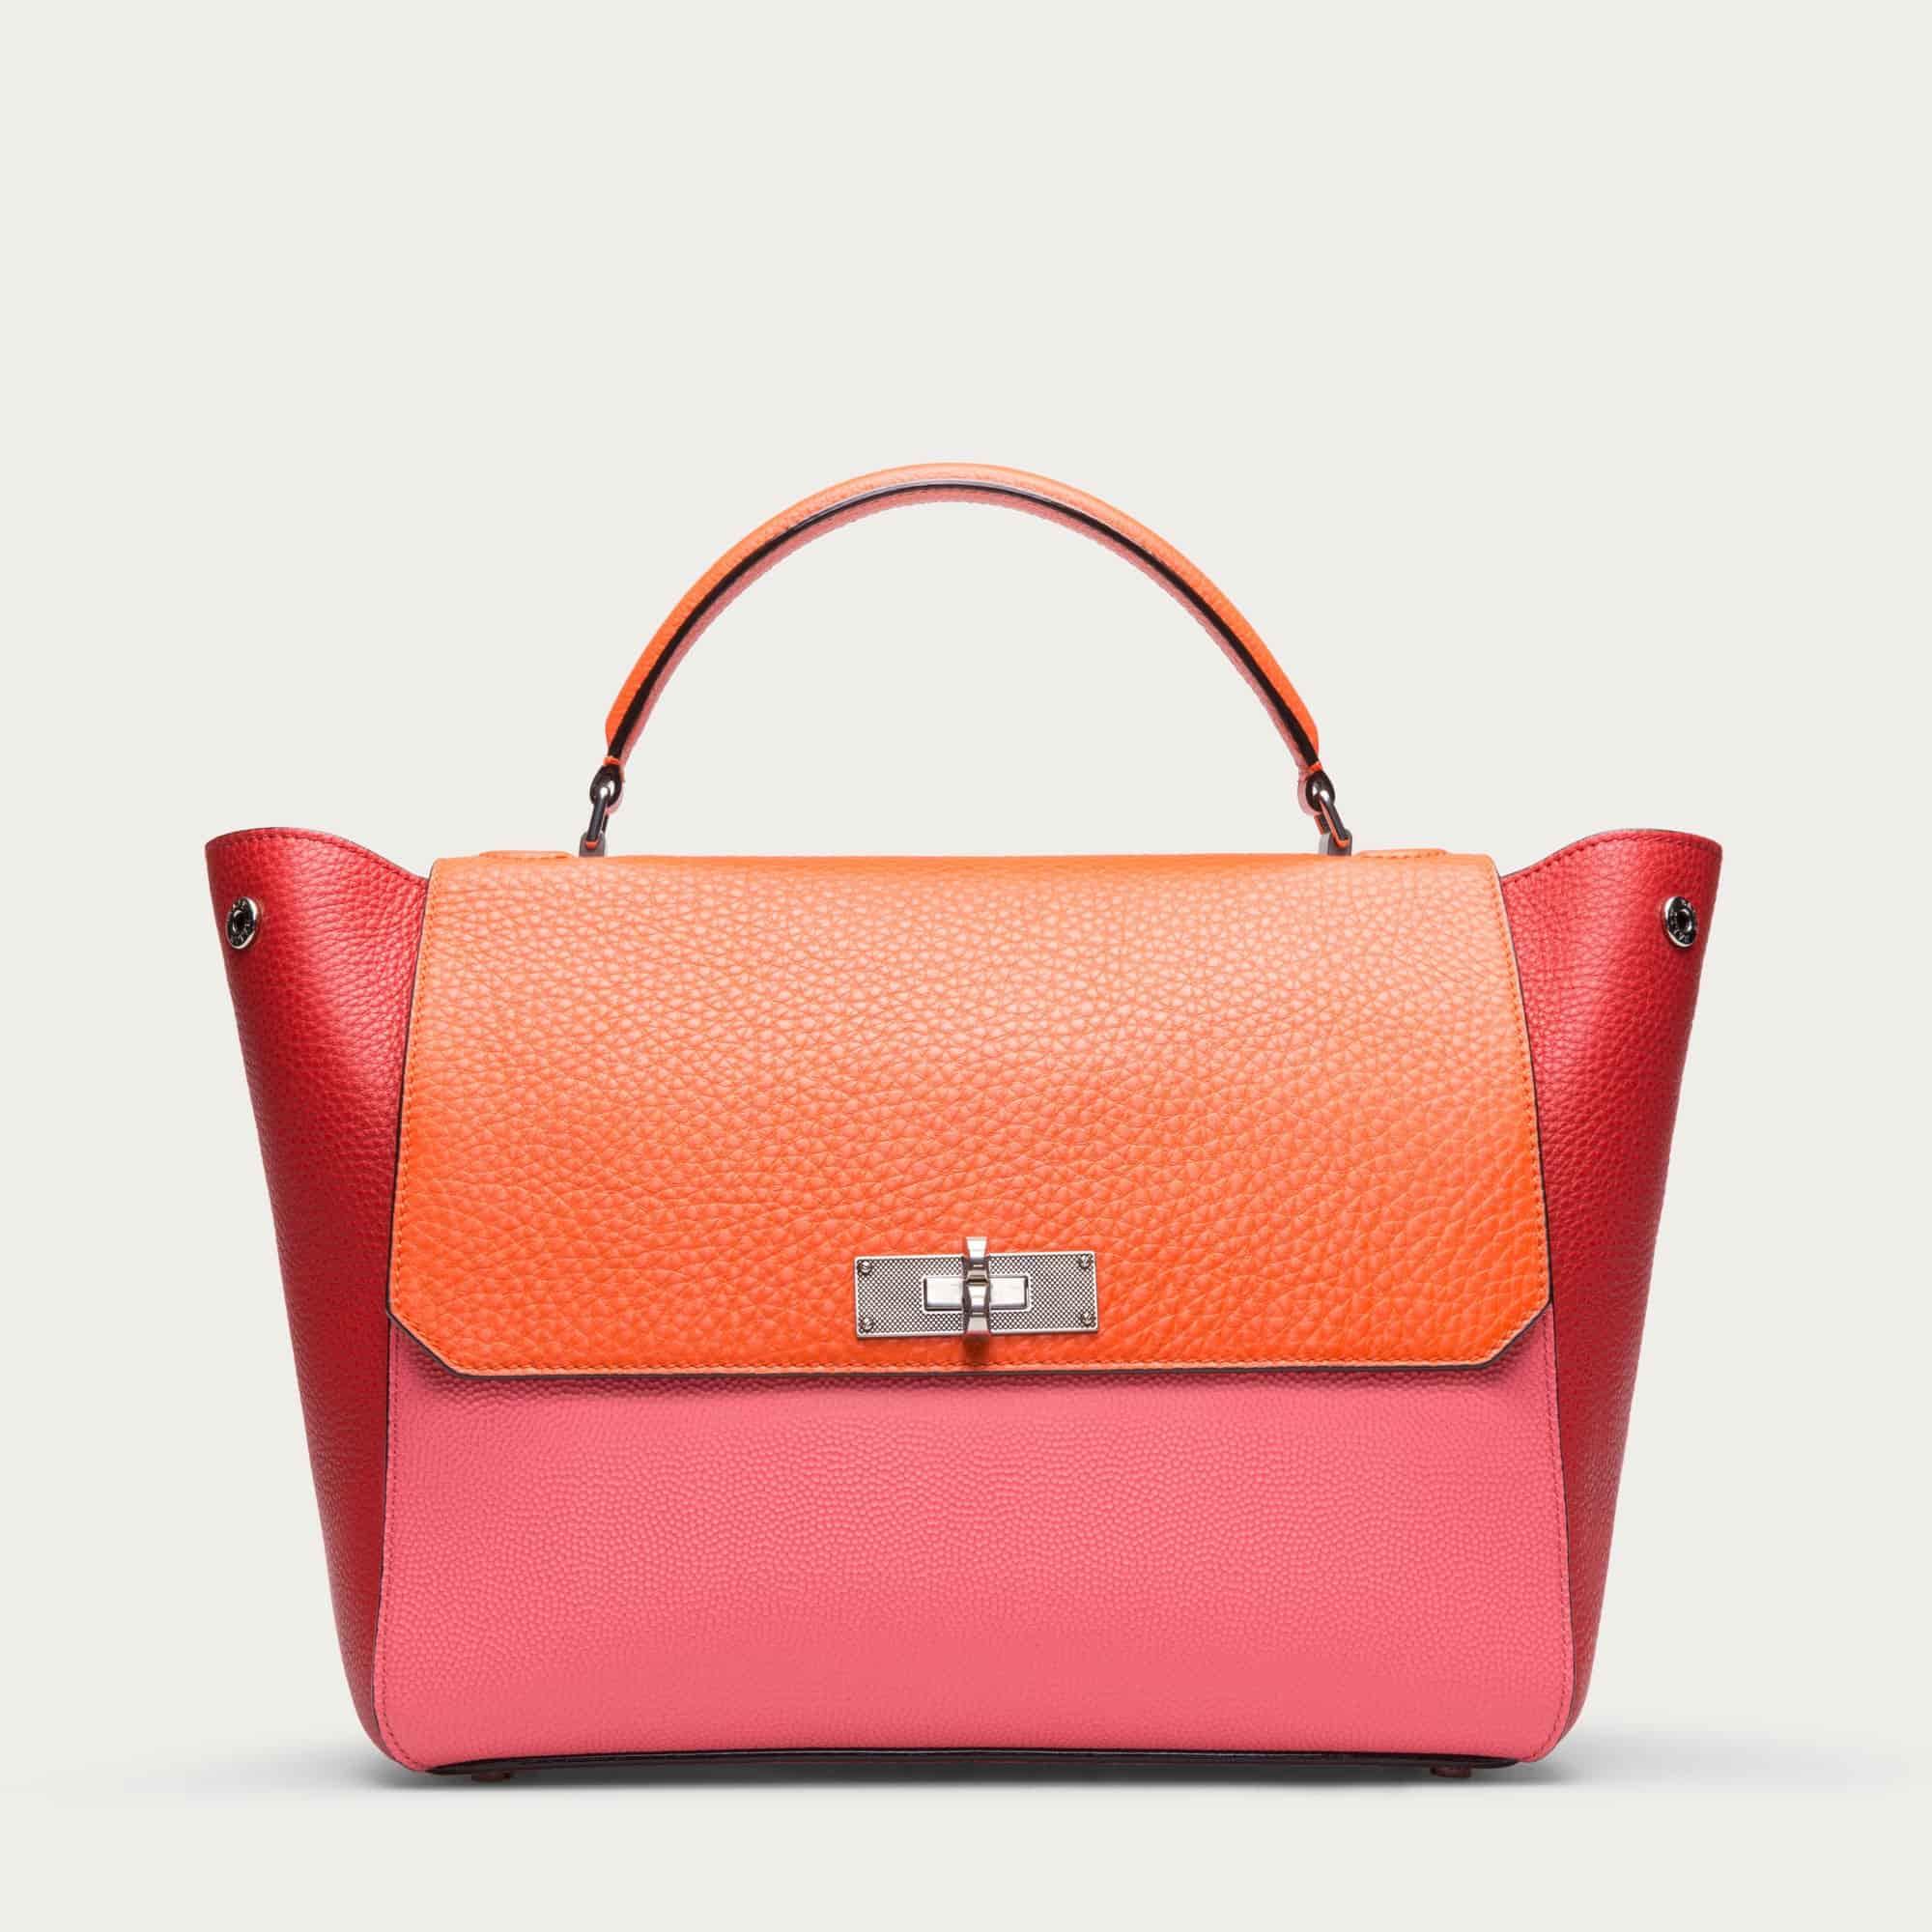 Bally Women B Turn Medium Leather Top Handle Bag Pasteque   000000006203752001  d9951a2c0b